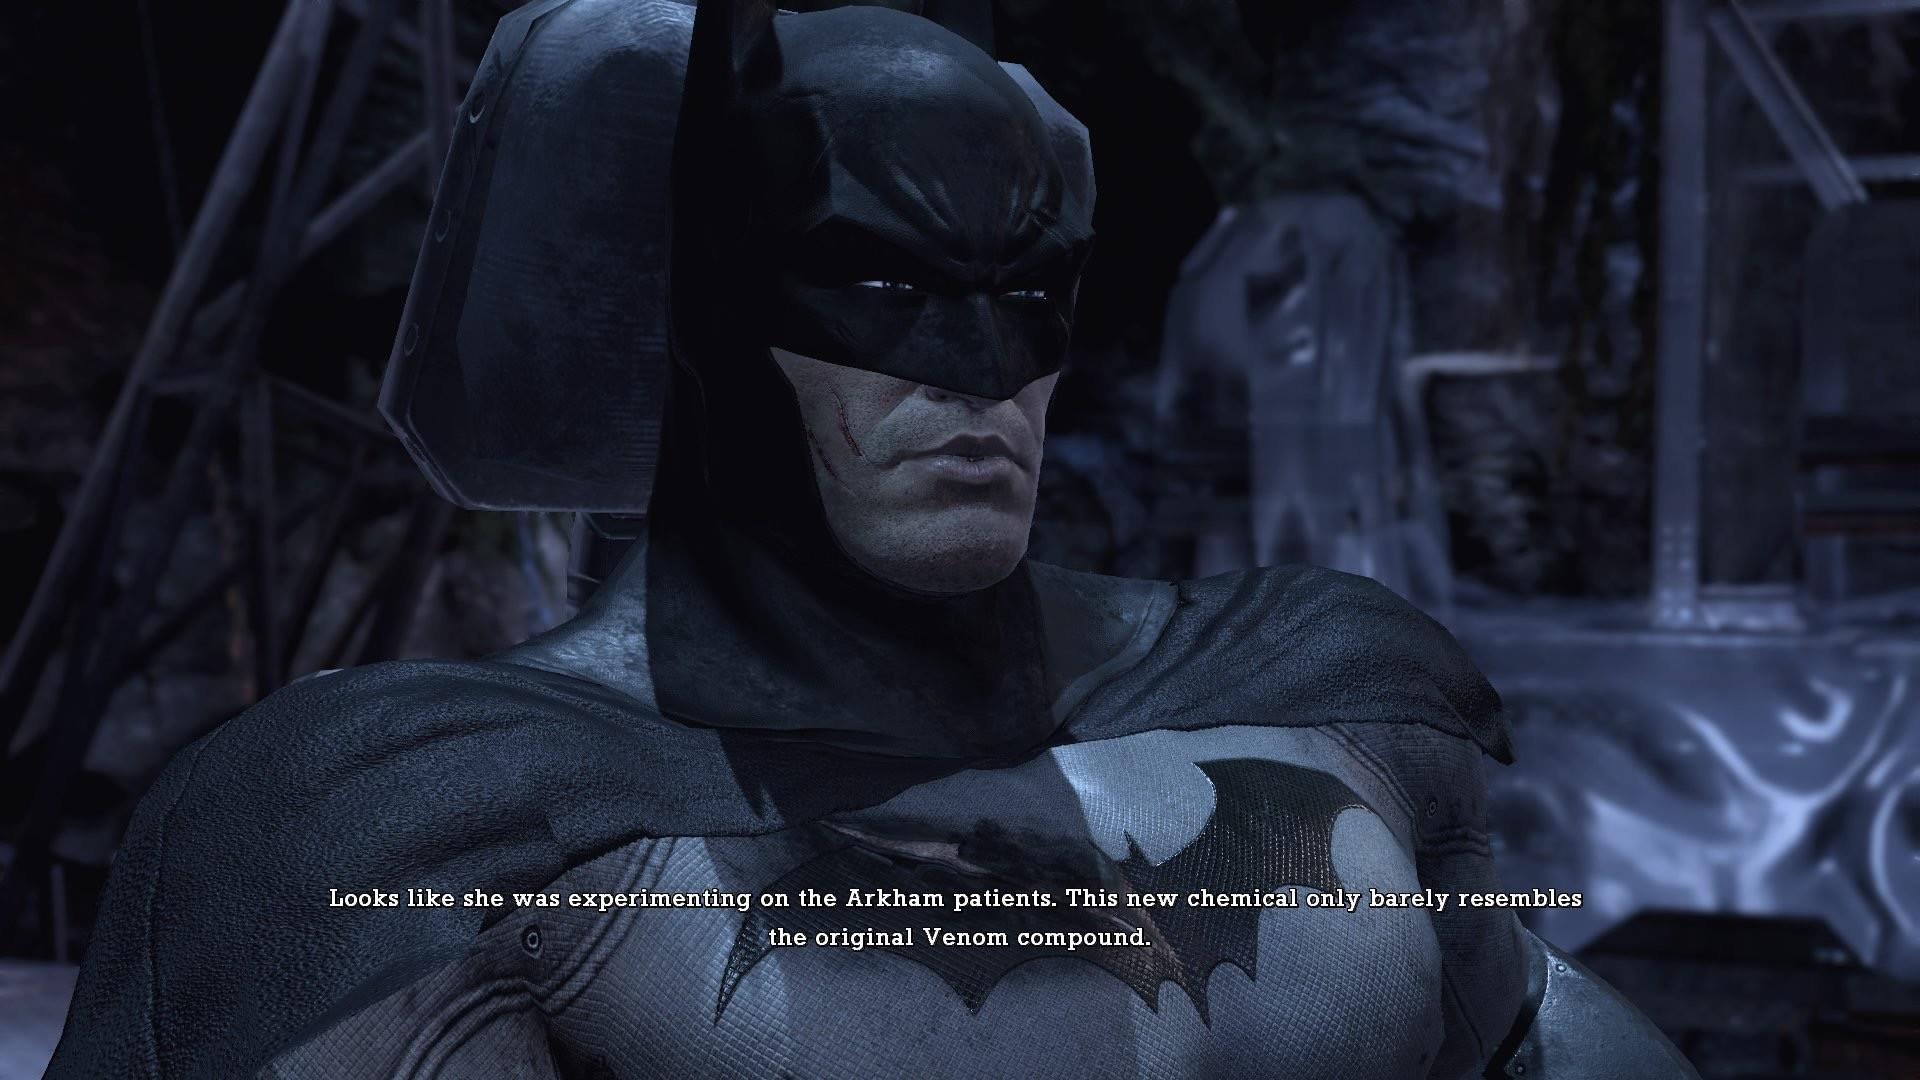 … Batman In His Bat Computer by PhantomEvil